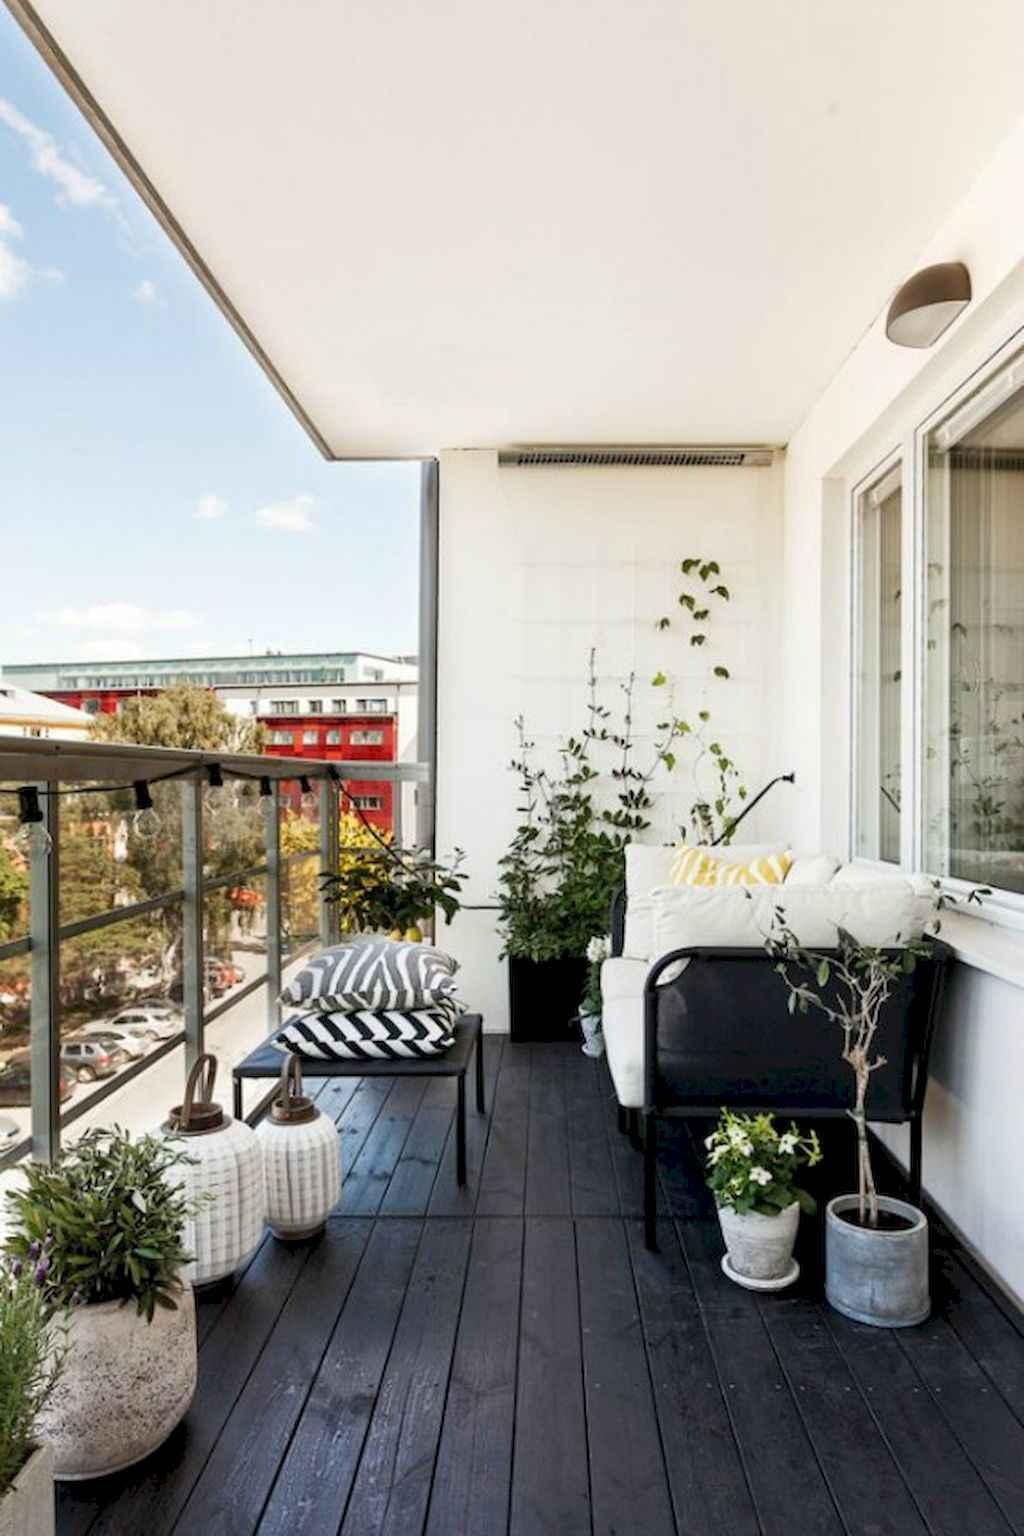 Cozy small apartment balcony decorating ideas 19 for Apartment balcony design ideas